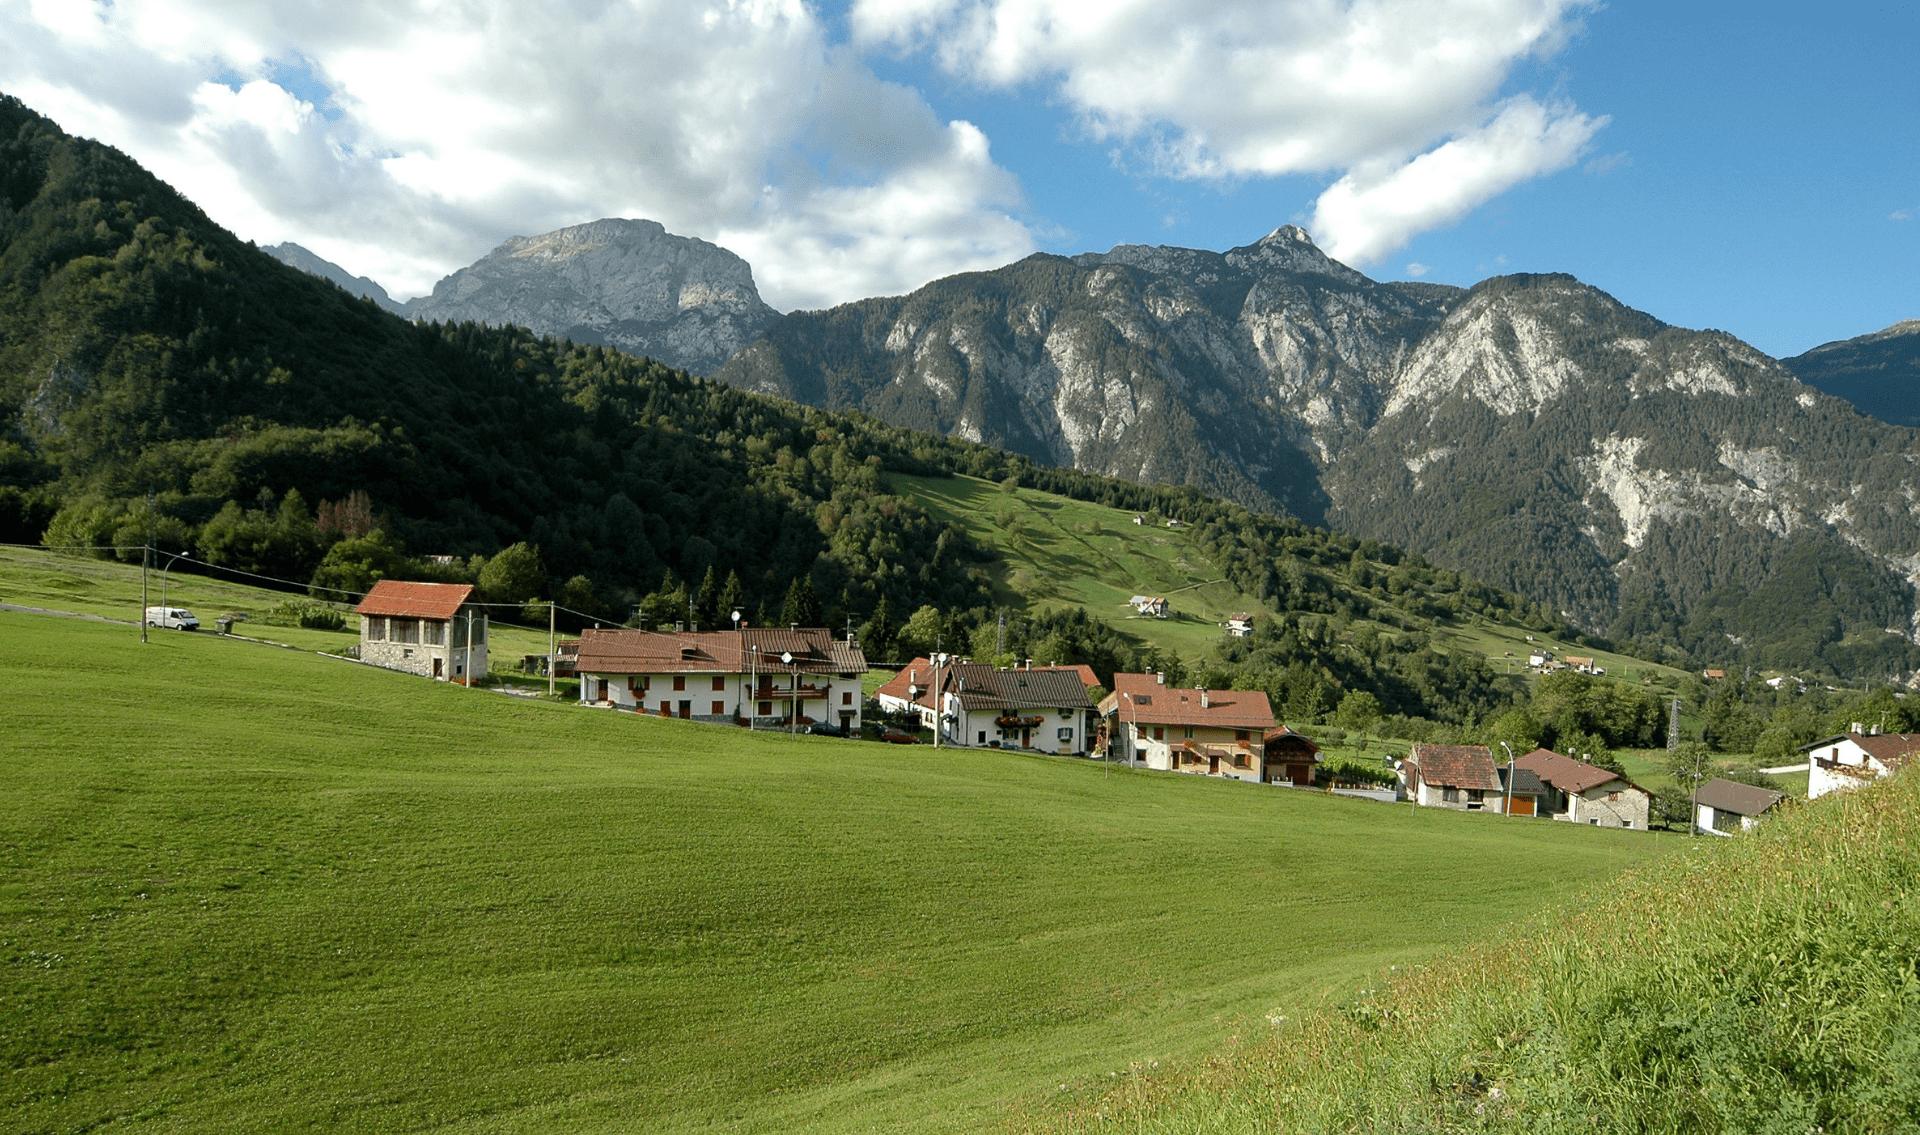 Fietsvakantie Alpe Adria